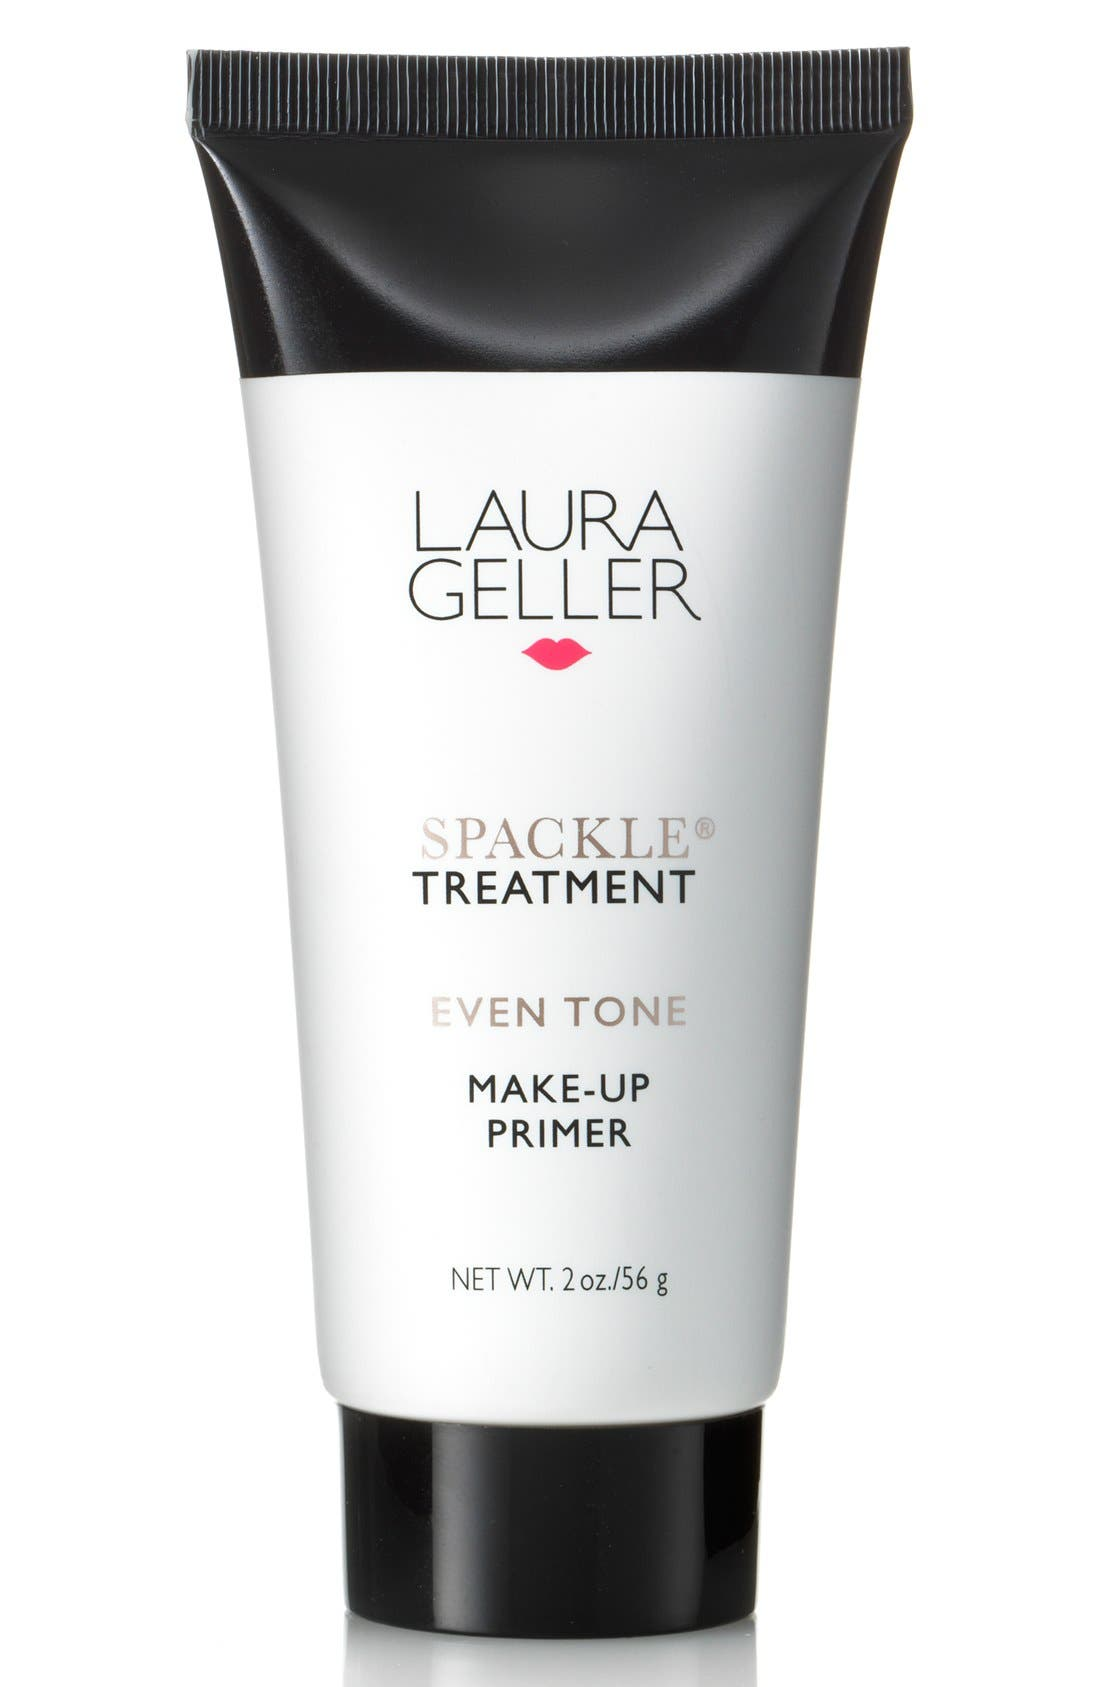 Laura Geller Beauty 'Spackle® Treatment' Even Tone Makeup Primer